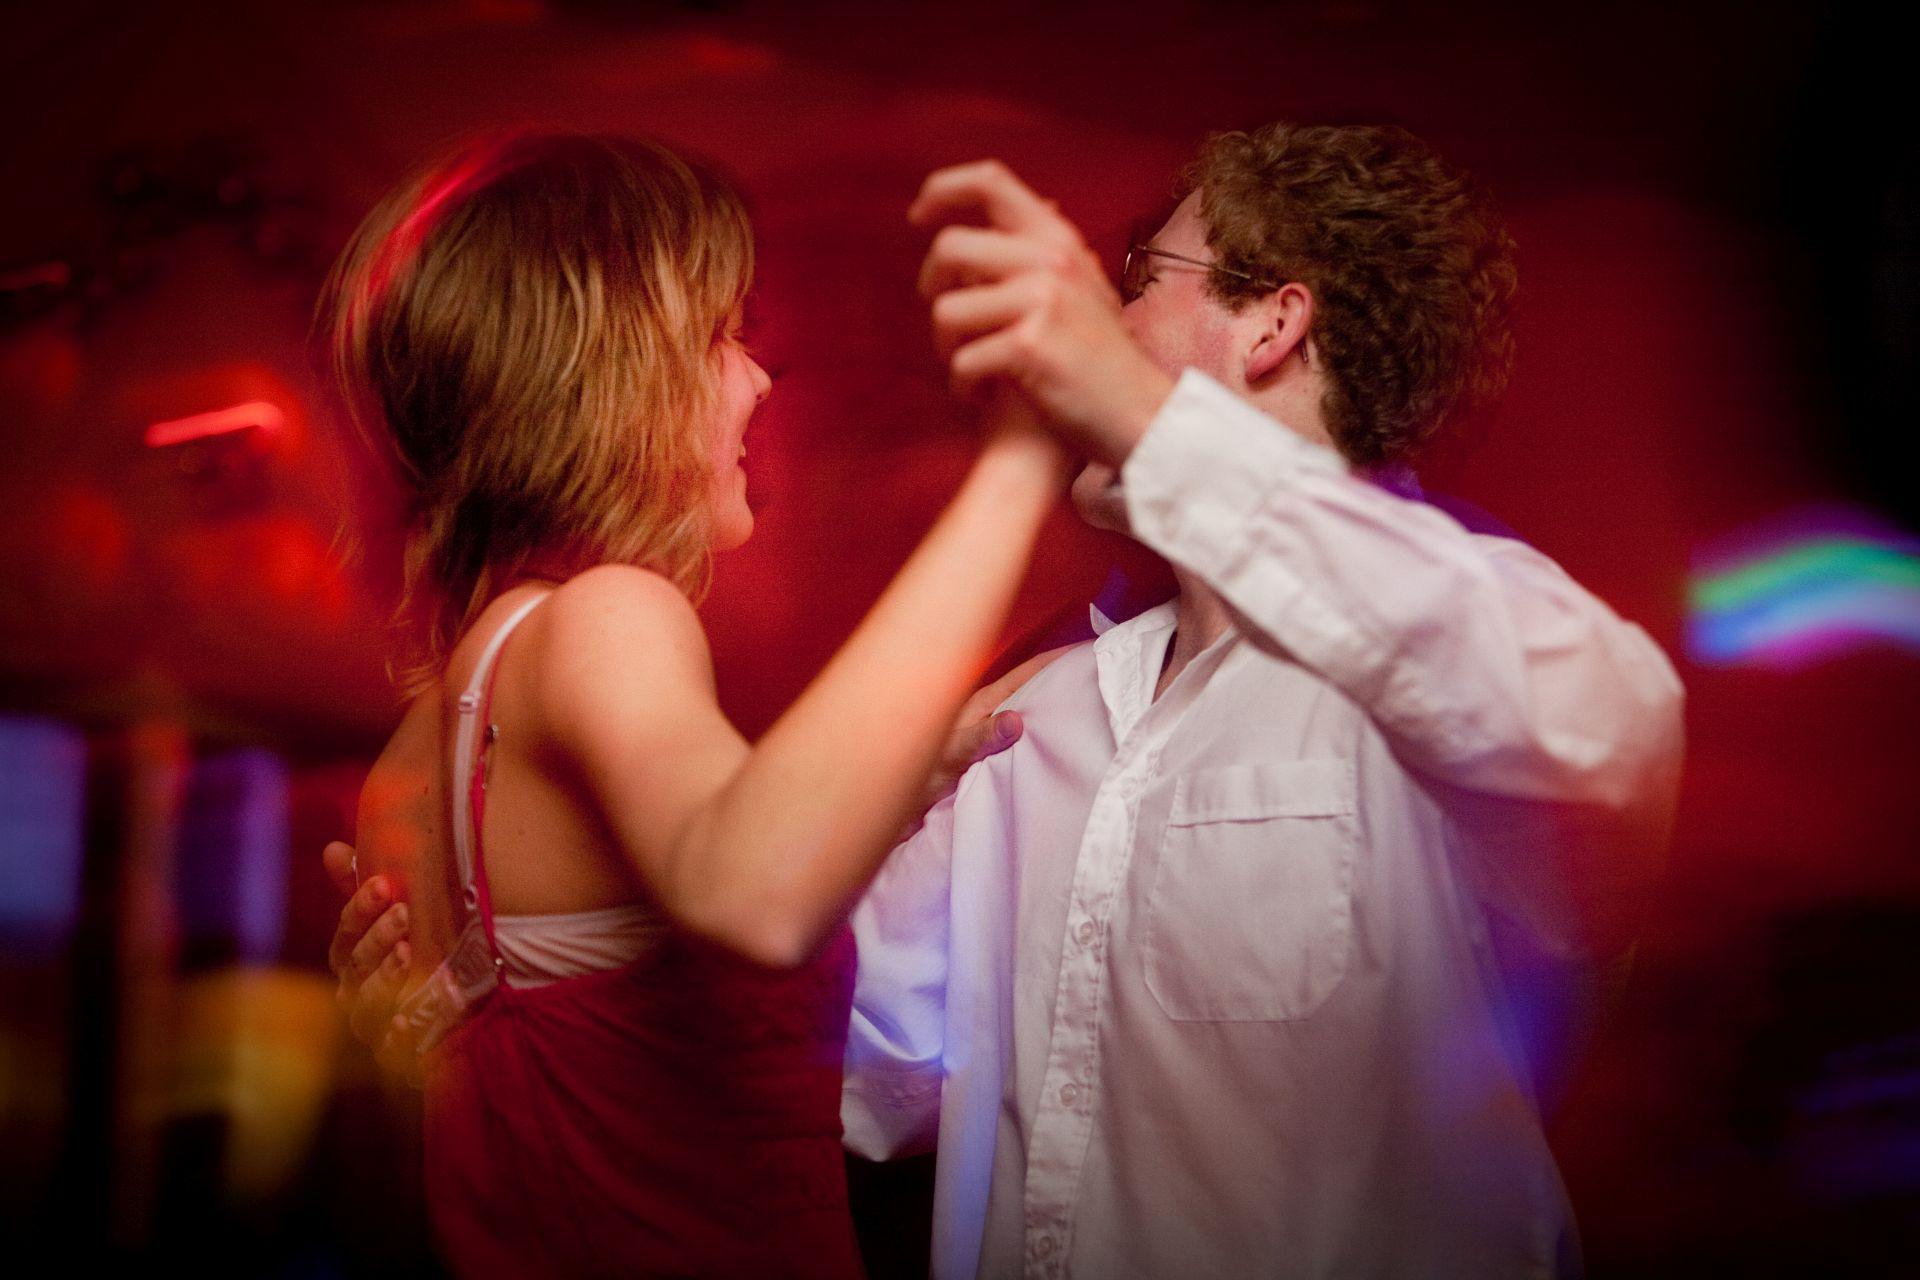 E1 Concert en feest Dansen bij Kluver-6